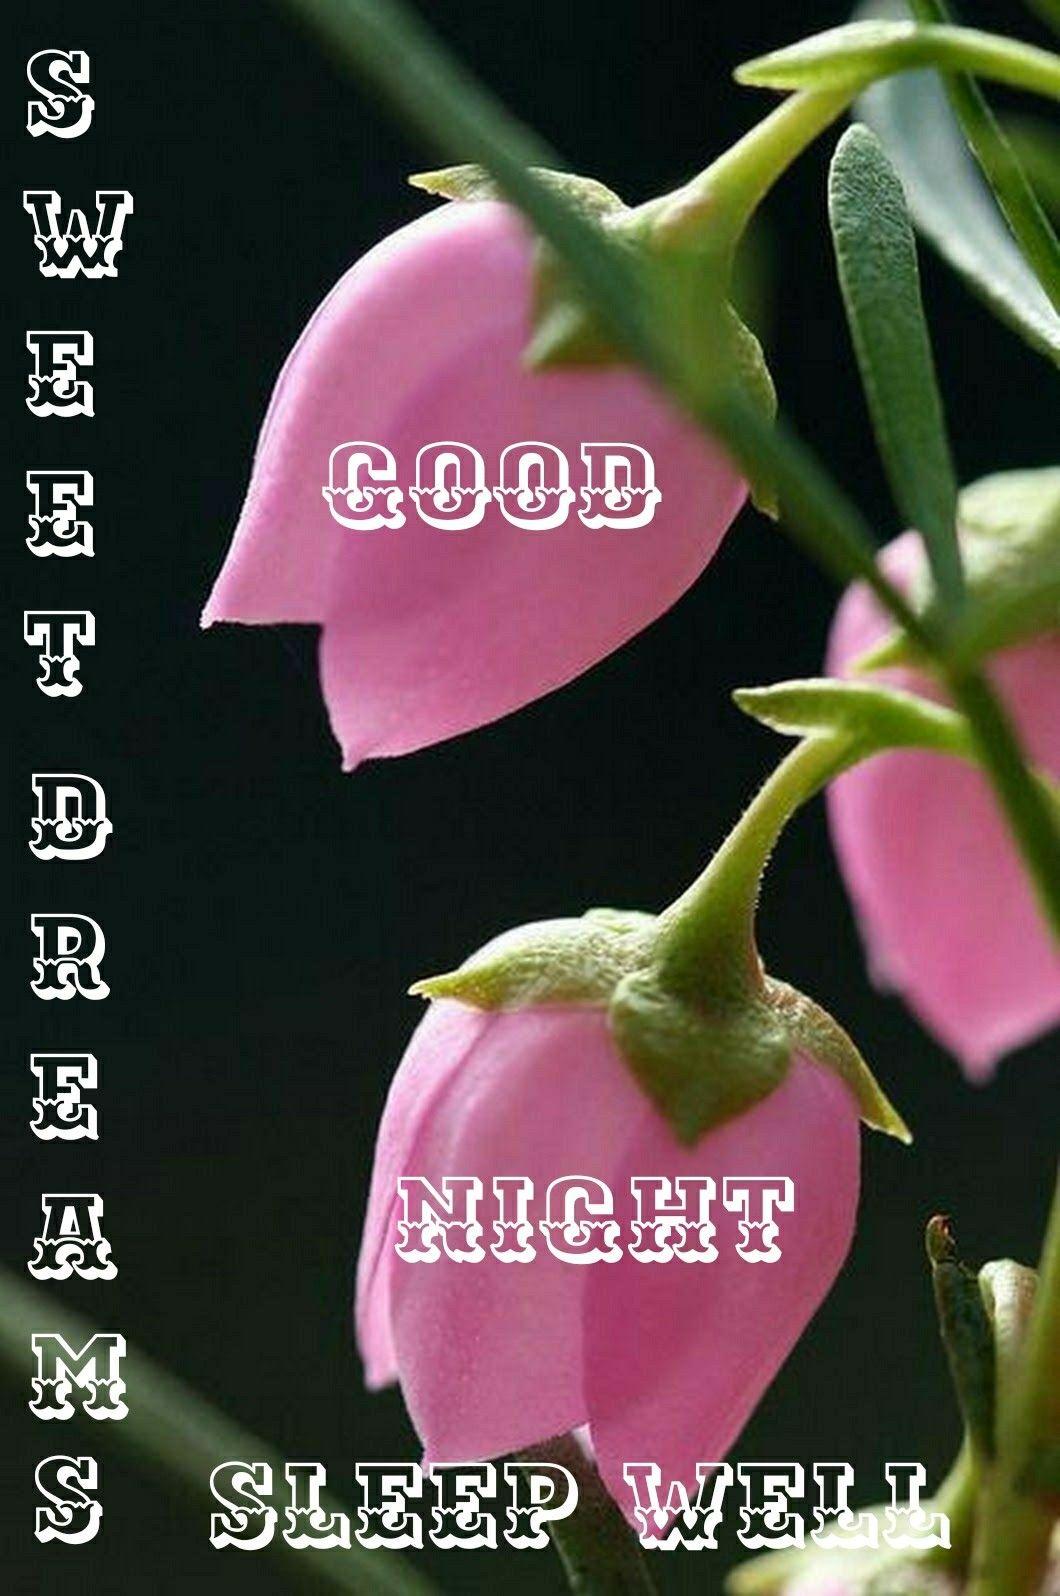 Pin By Jharna Thakkar On Good Nighty Nite Good Night Wishes Good Night Blessings Night Wishes